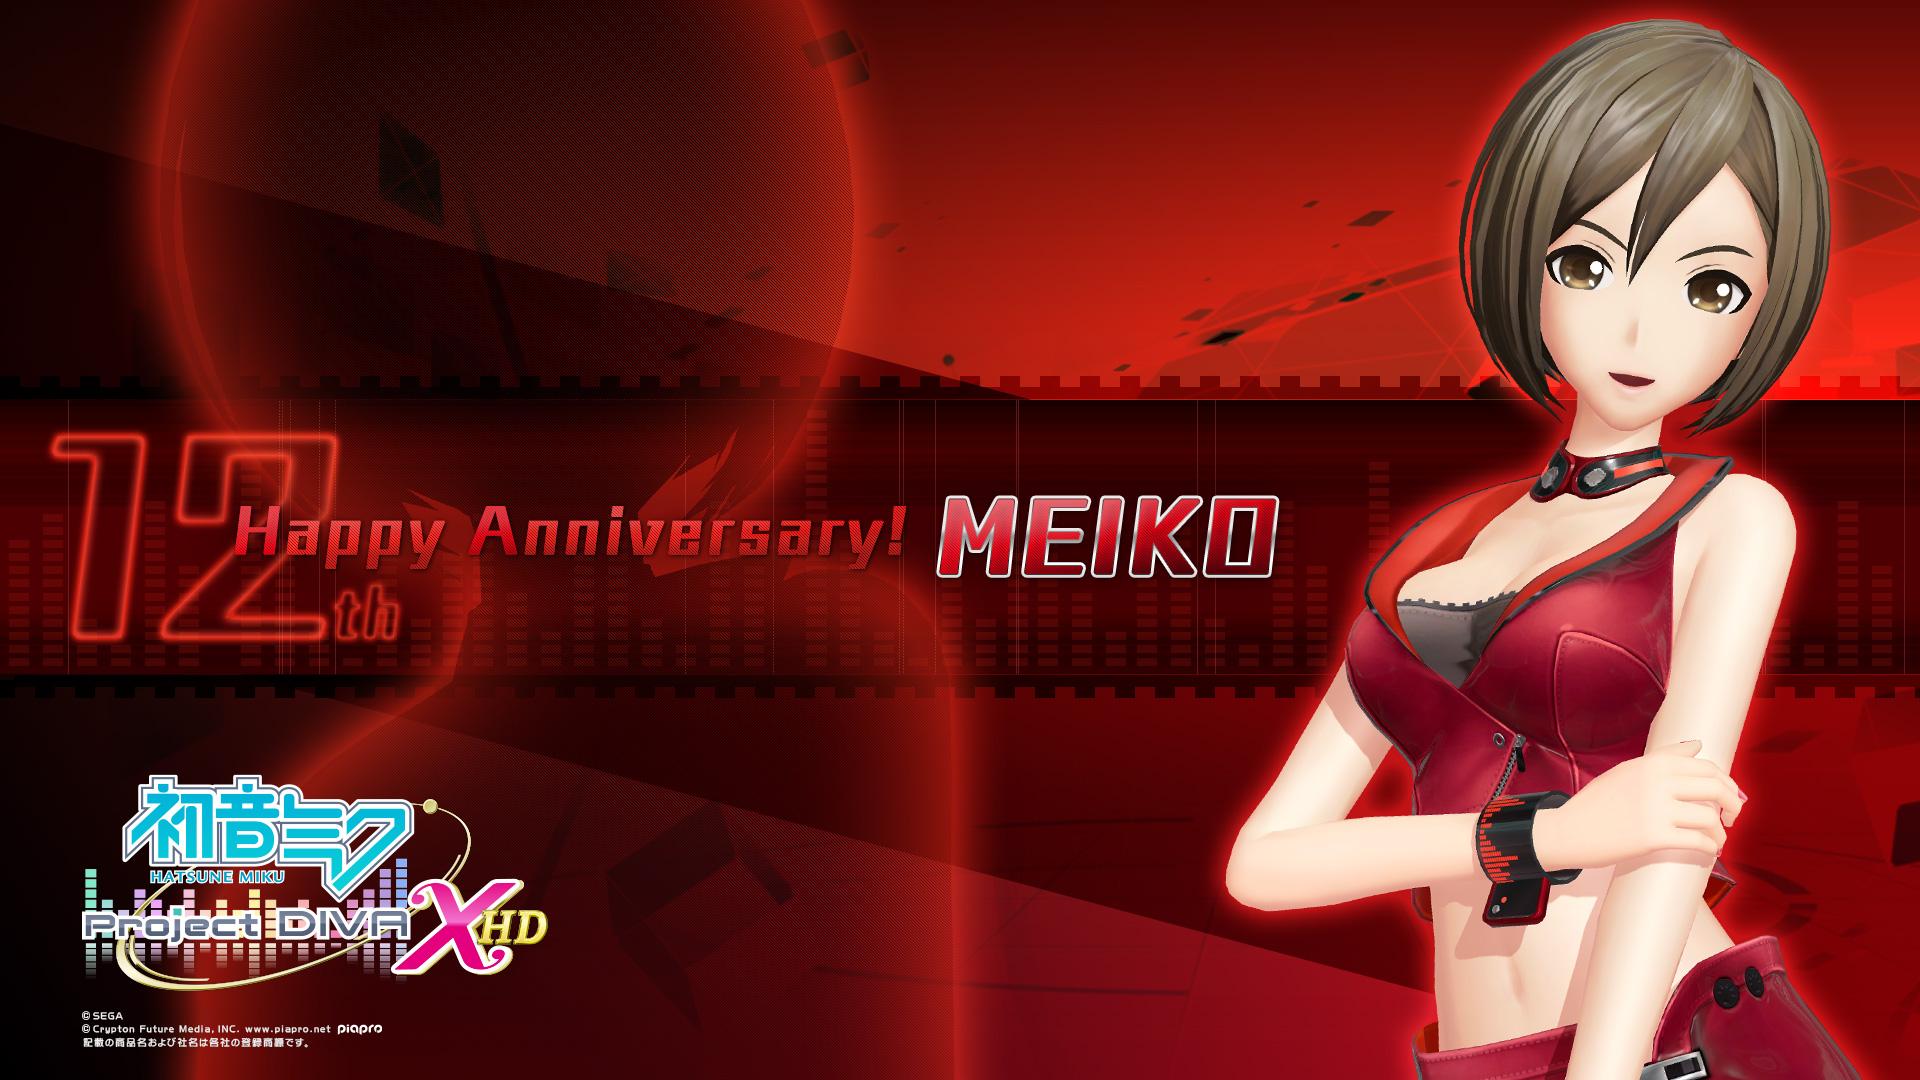 MEIKO HD Wallpaper Background Image 1920x1080 ID932506 1920x1080